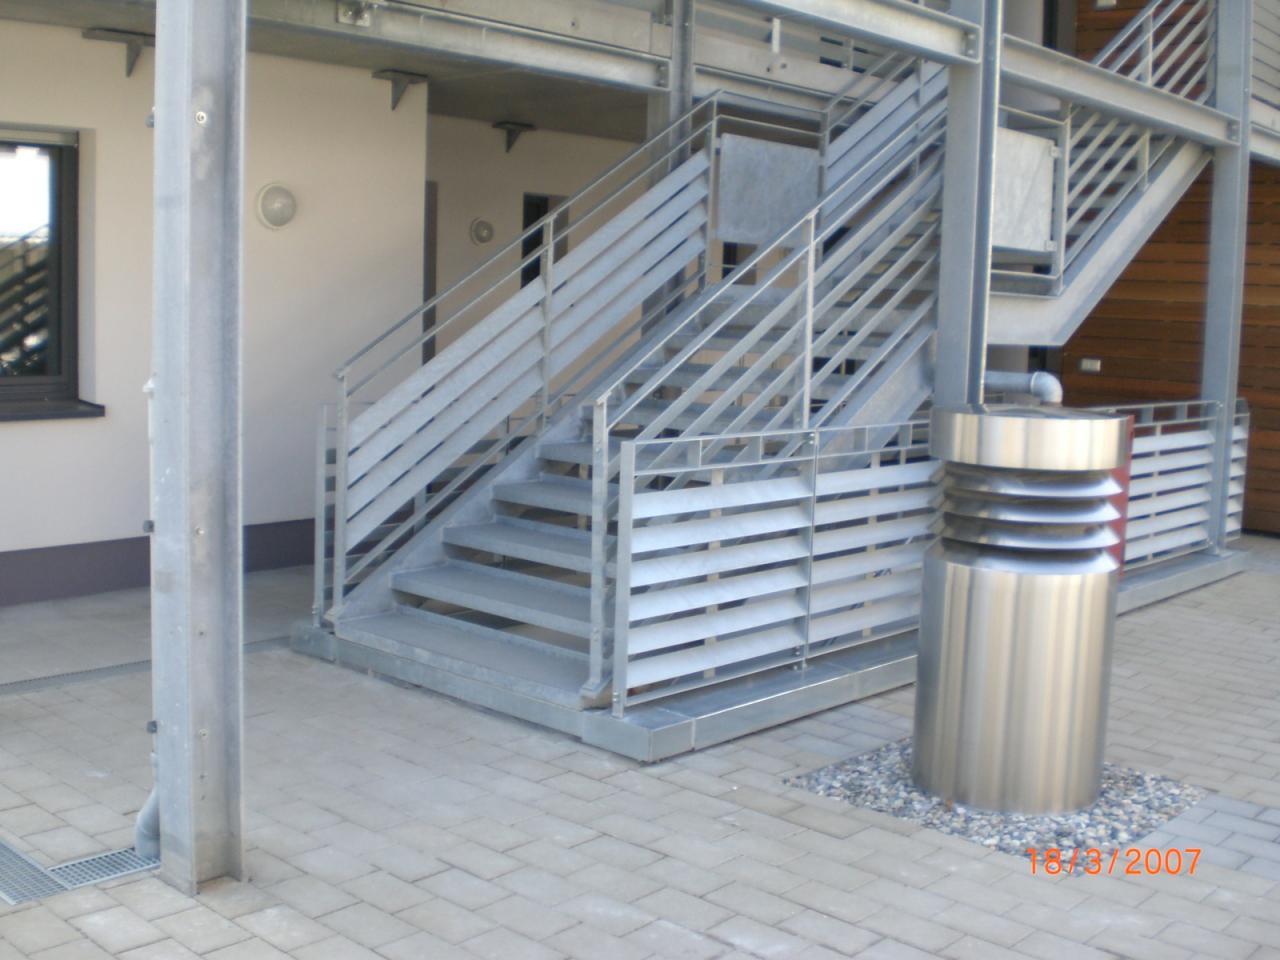 Escalier et garde-corps métallique galvanisé